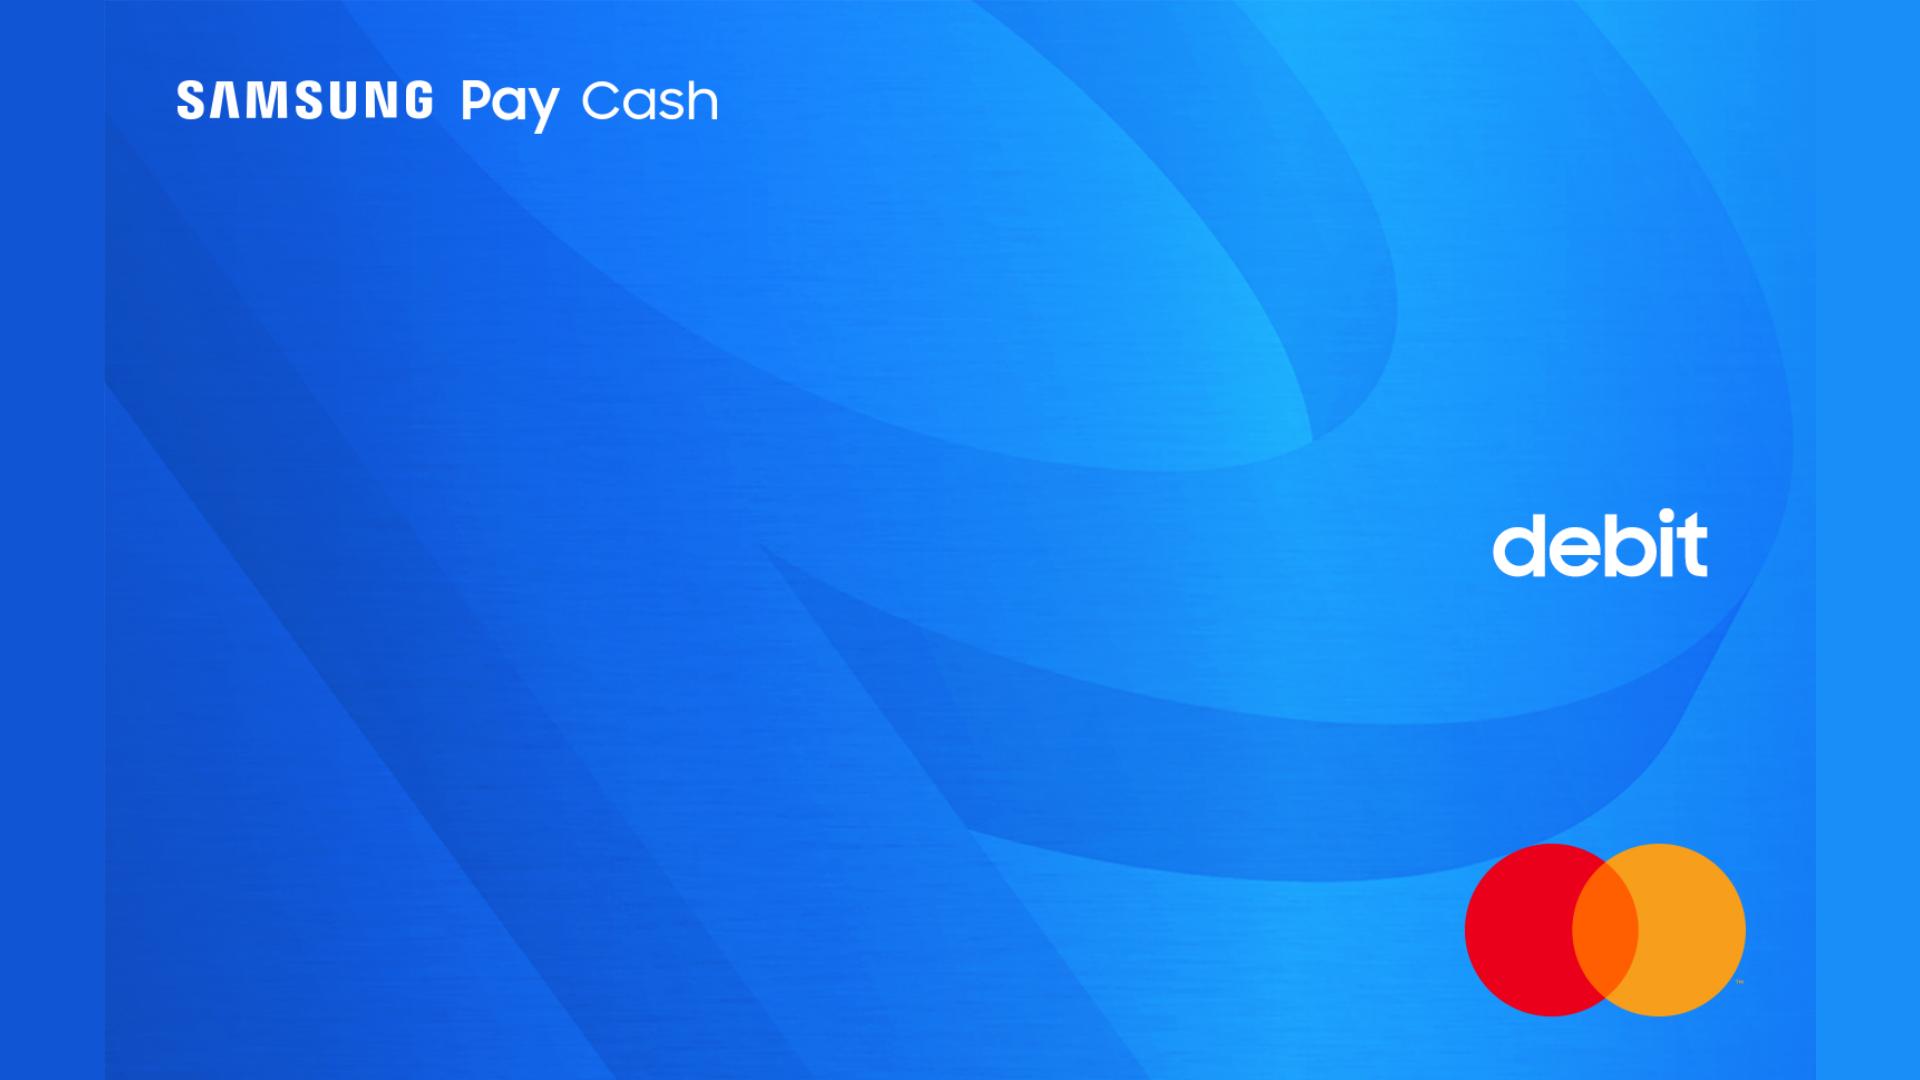 Samsung Pay Cash card